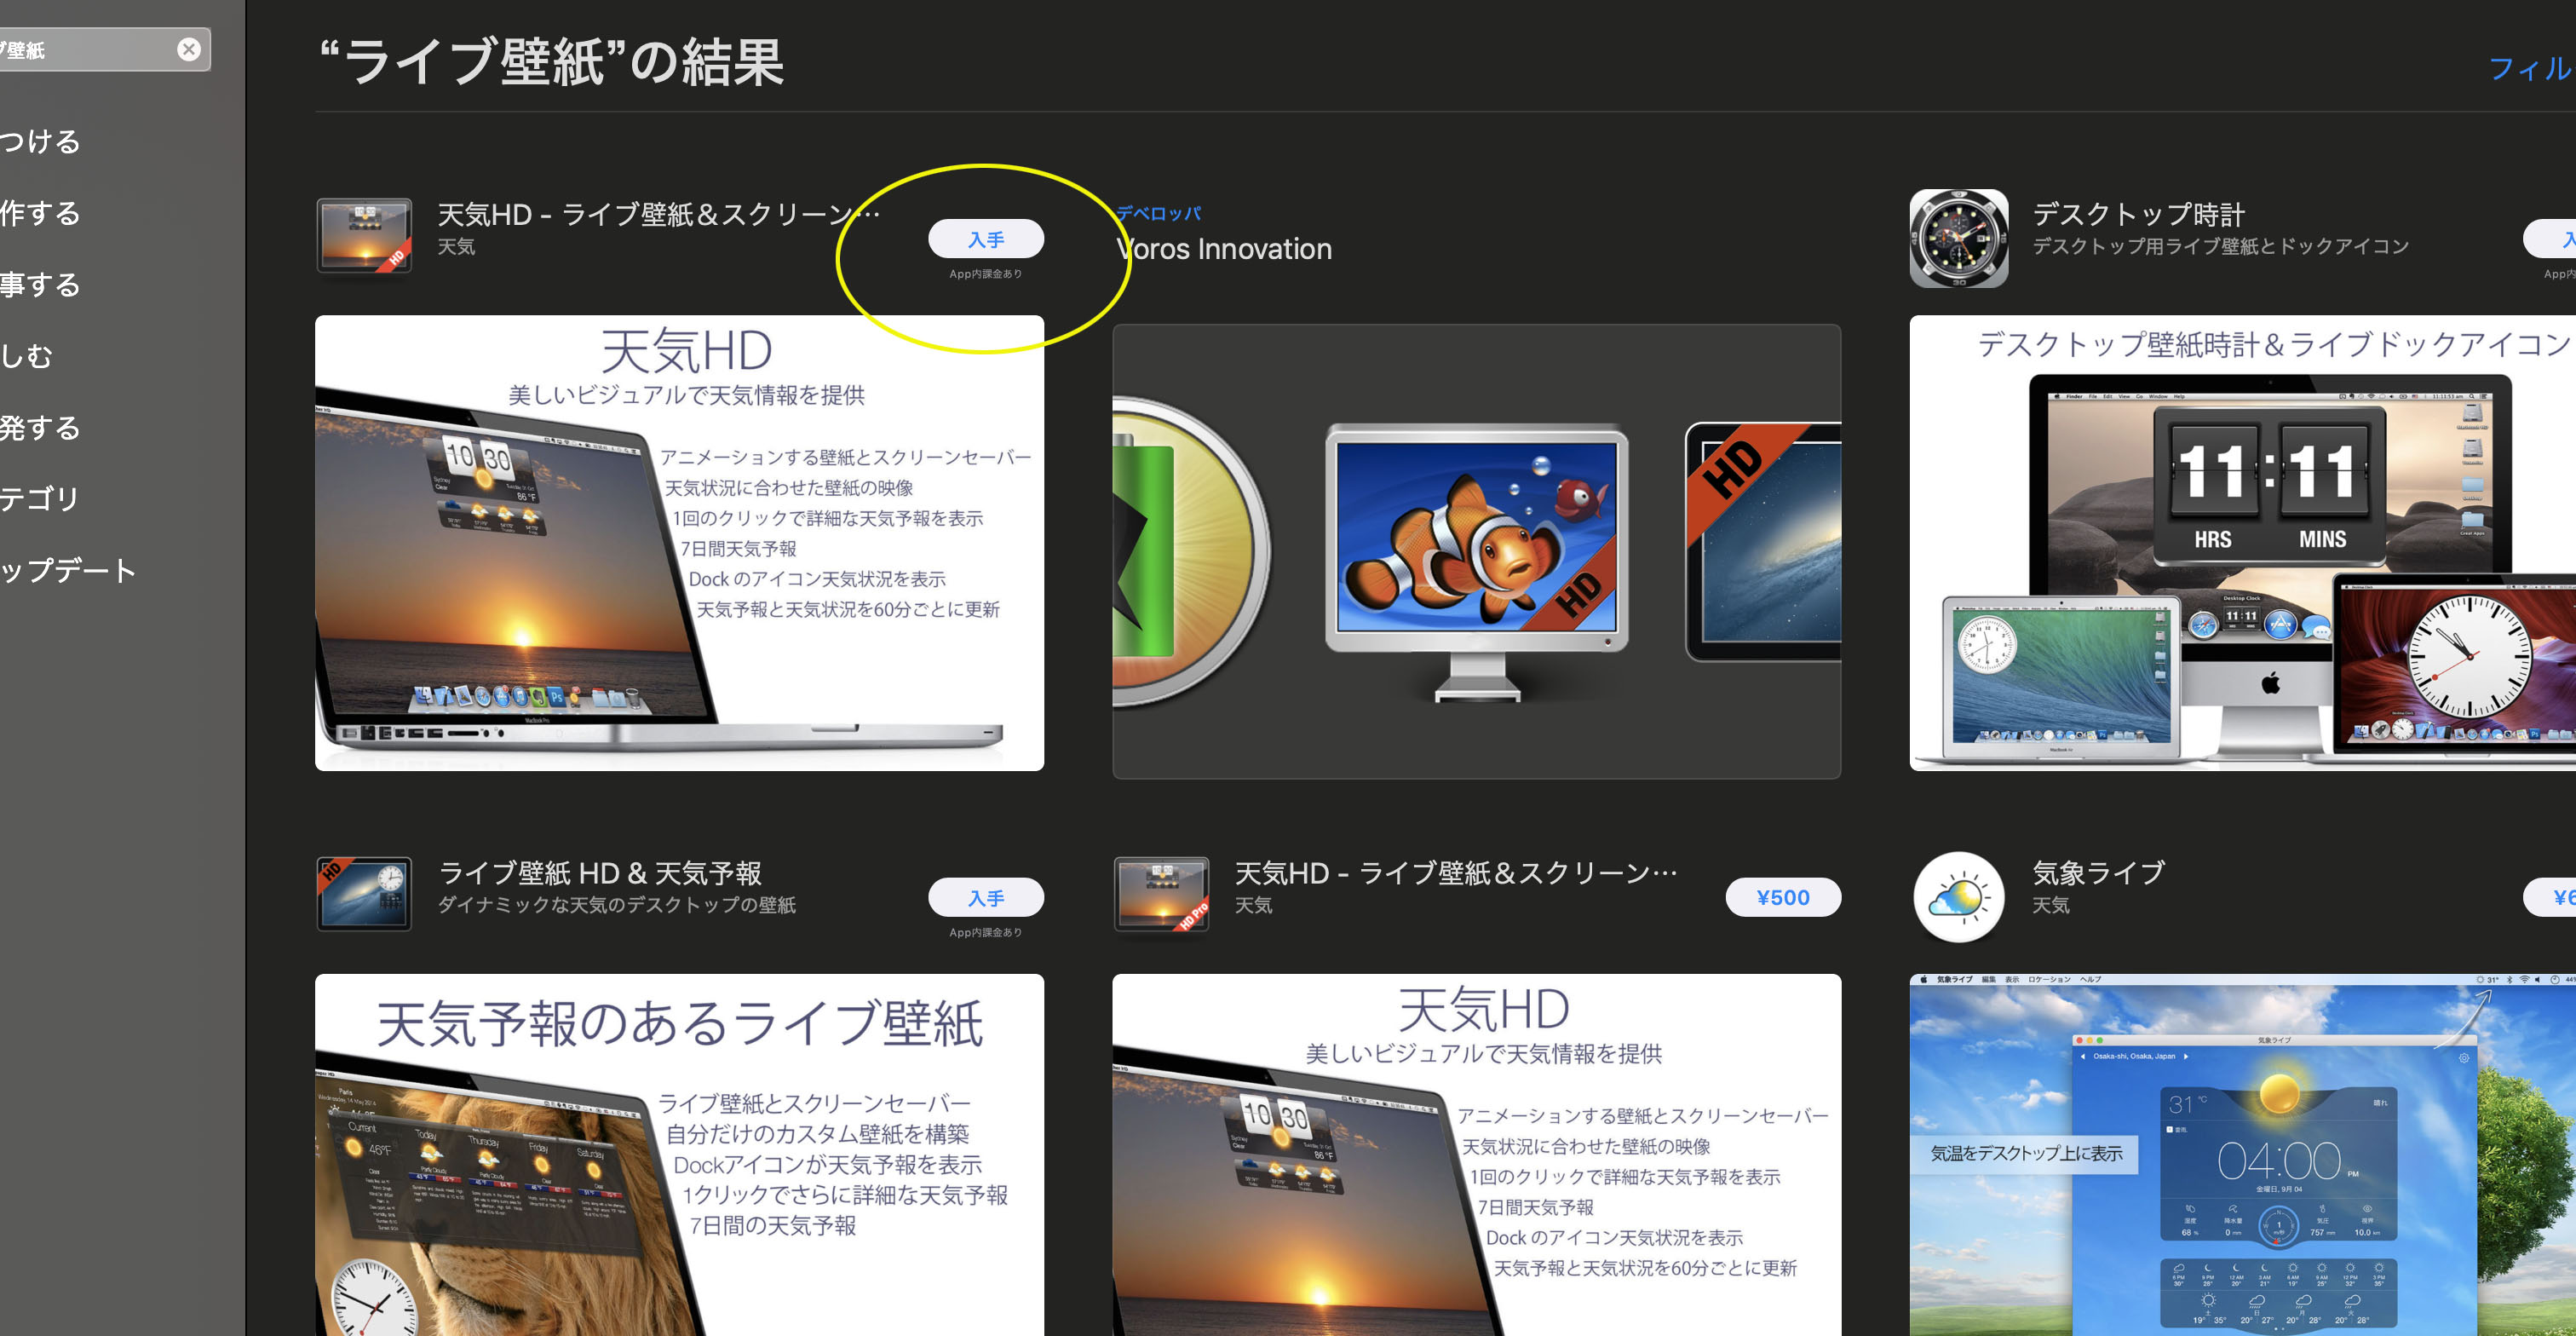 Macの壁紙を変更しておしゃれ かっこいいデスクトップにしよう スマホアプリやiphone Androidスマホなどの各種デバイスの使い方 最新情報を紹介するメディアです